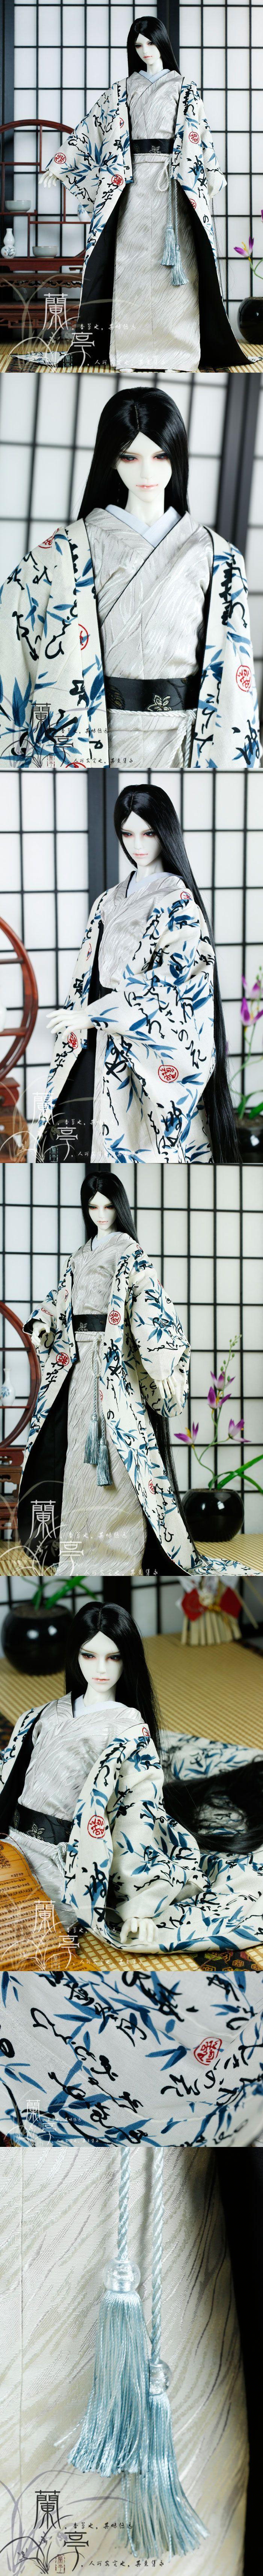 BJD Clothes Boy/Male Kimono [Zhujun] for 80cm/75cm/70cm/SD/MSD/YSD Ball-jointed Doll_CLOTHING_Ball Jointed Dolls (BJD) company-Legenddoll